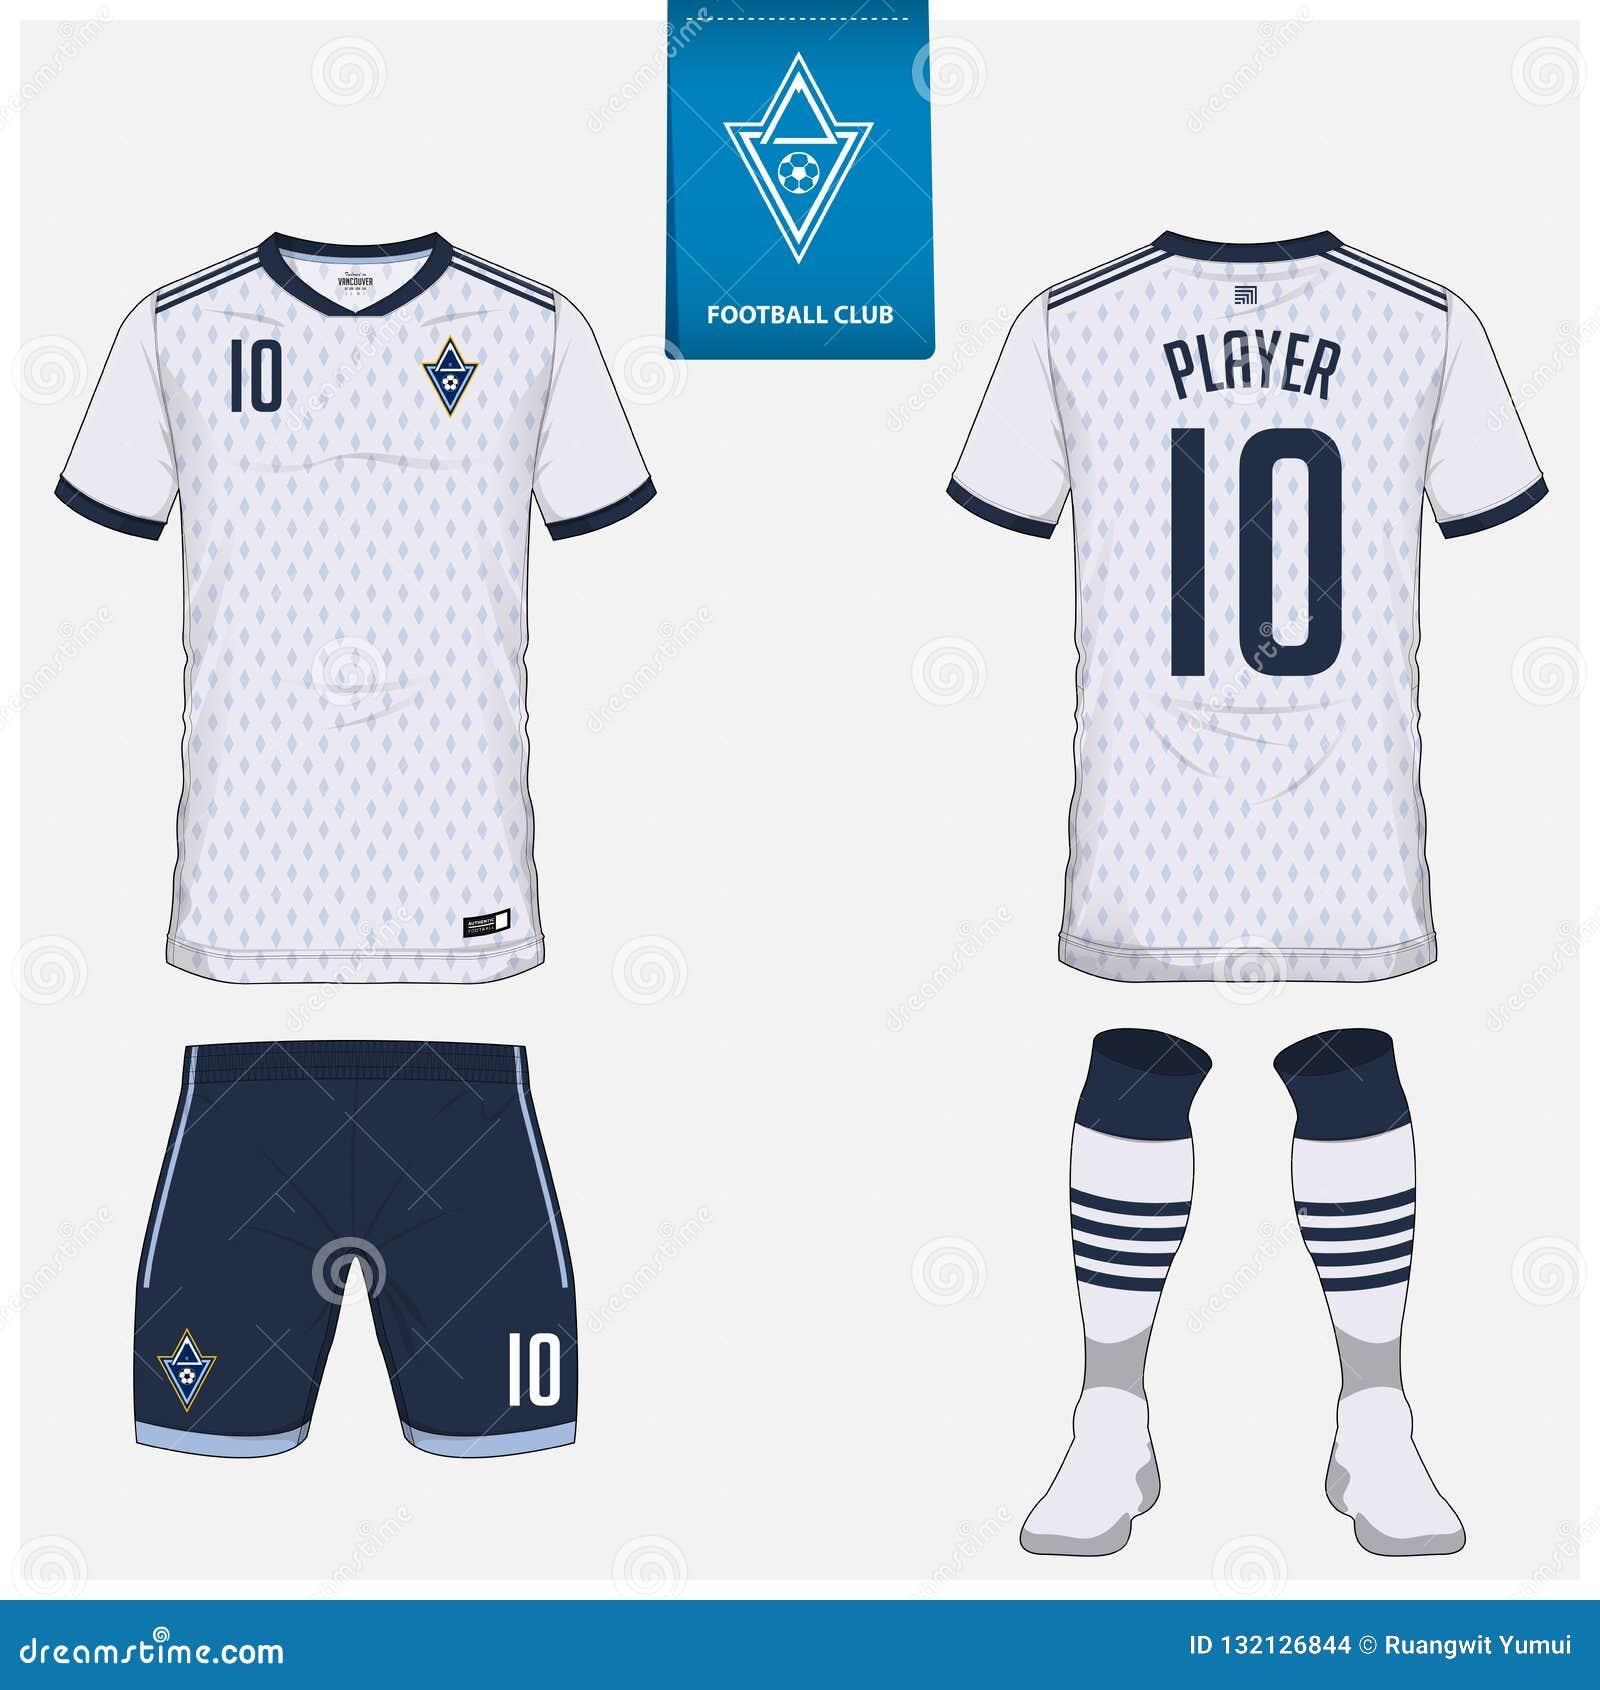 a8dbd57e7 Soccer Jersey Or Football Kit